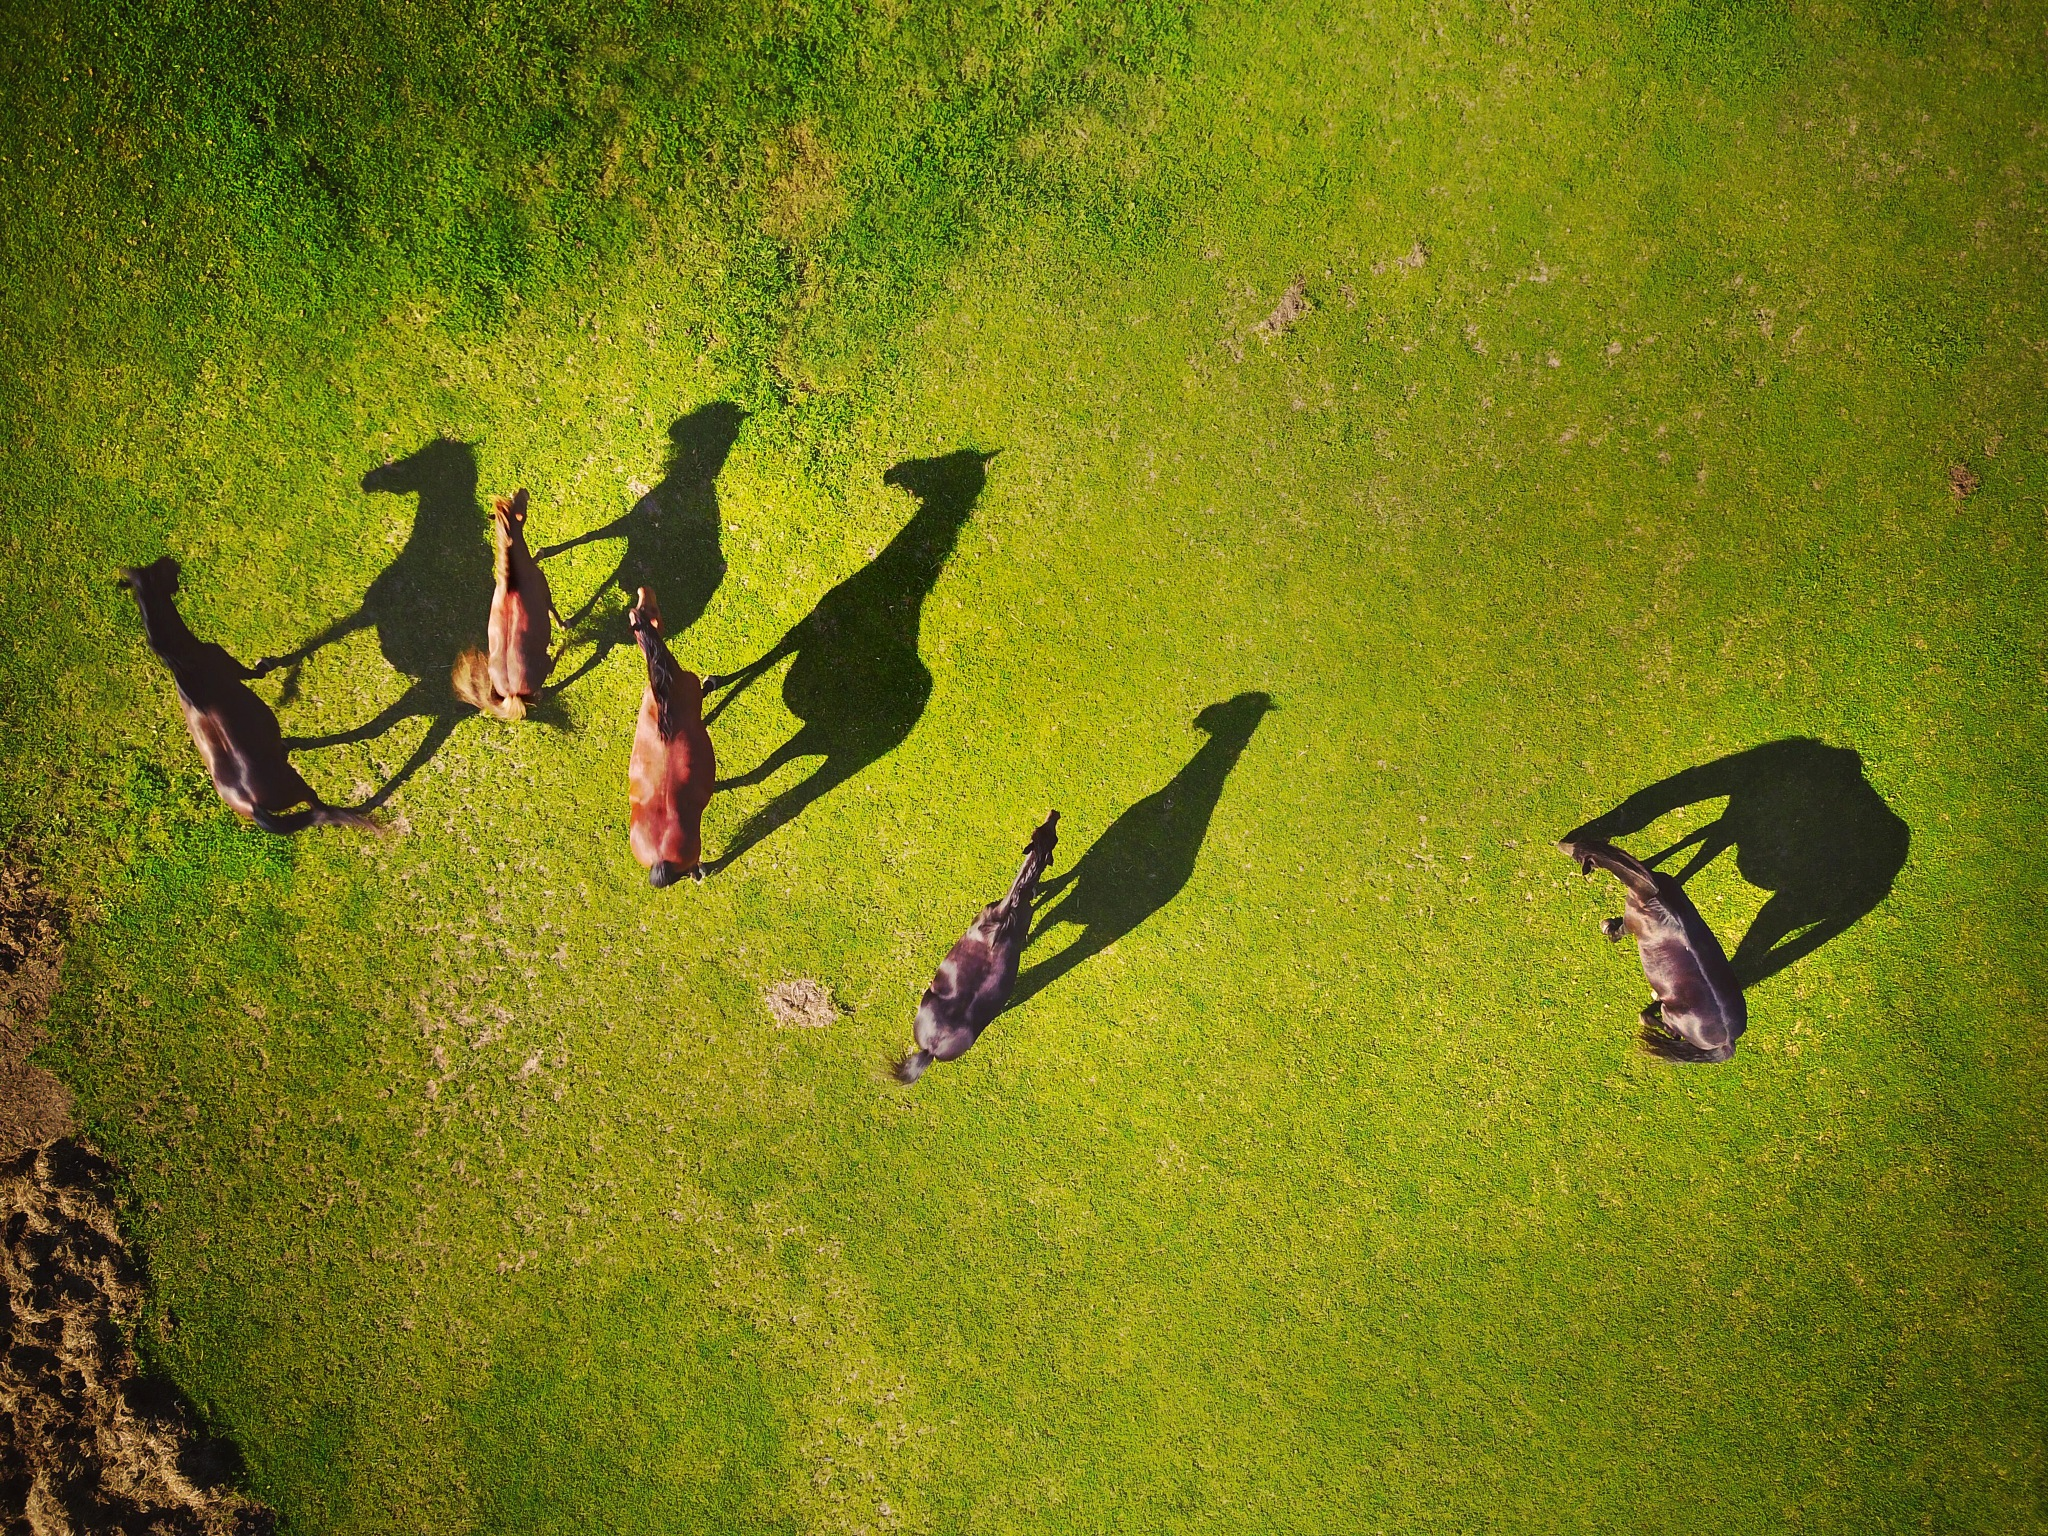 Horse Shadows by Bruce Christianson